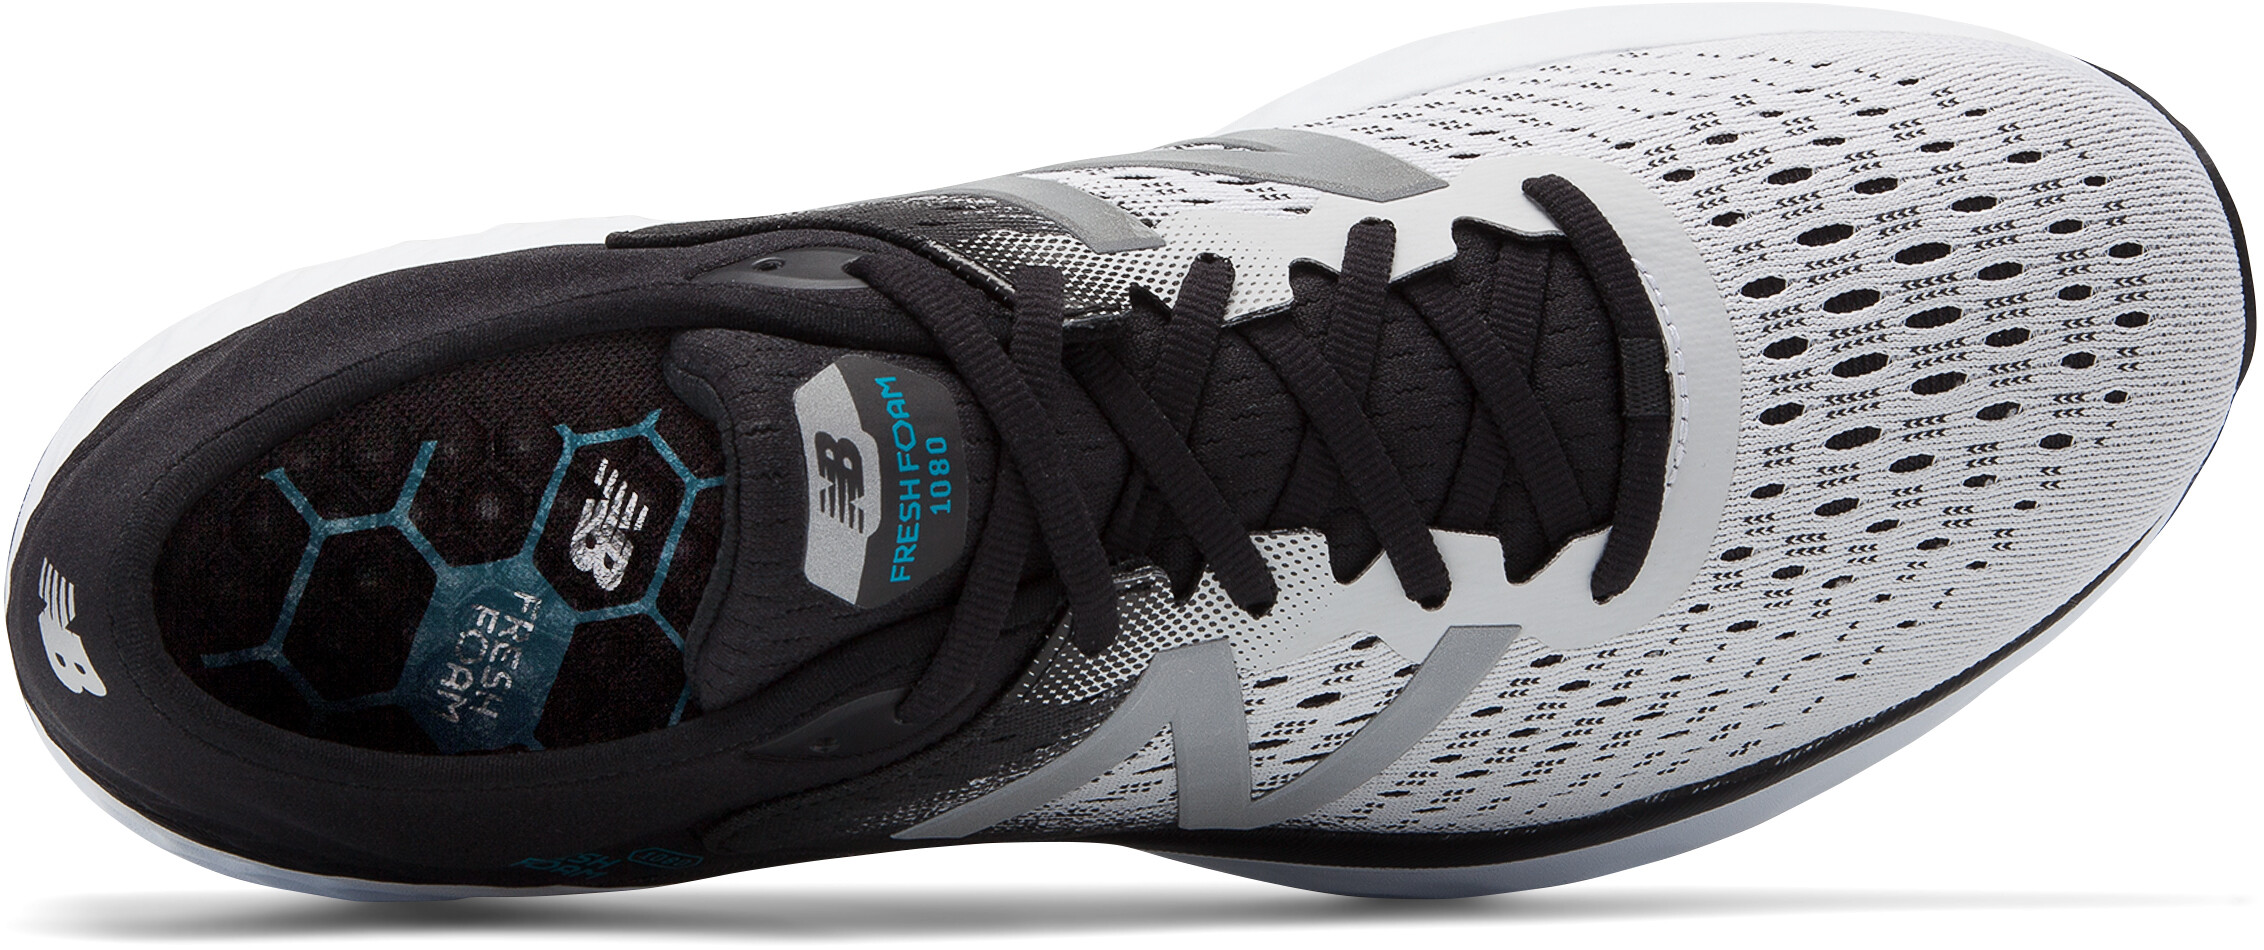 9094214fbc4 New Balance 1080 V9 - Chaussures running Homme - blanc noir ...